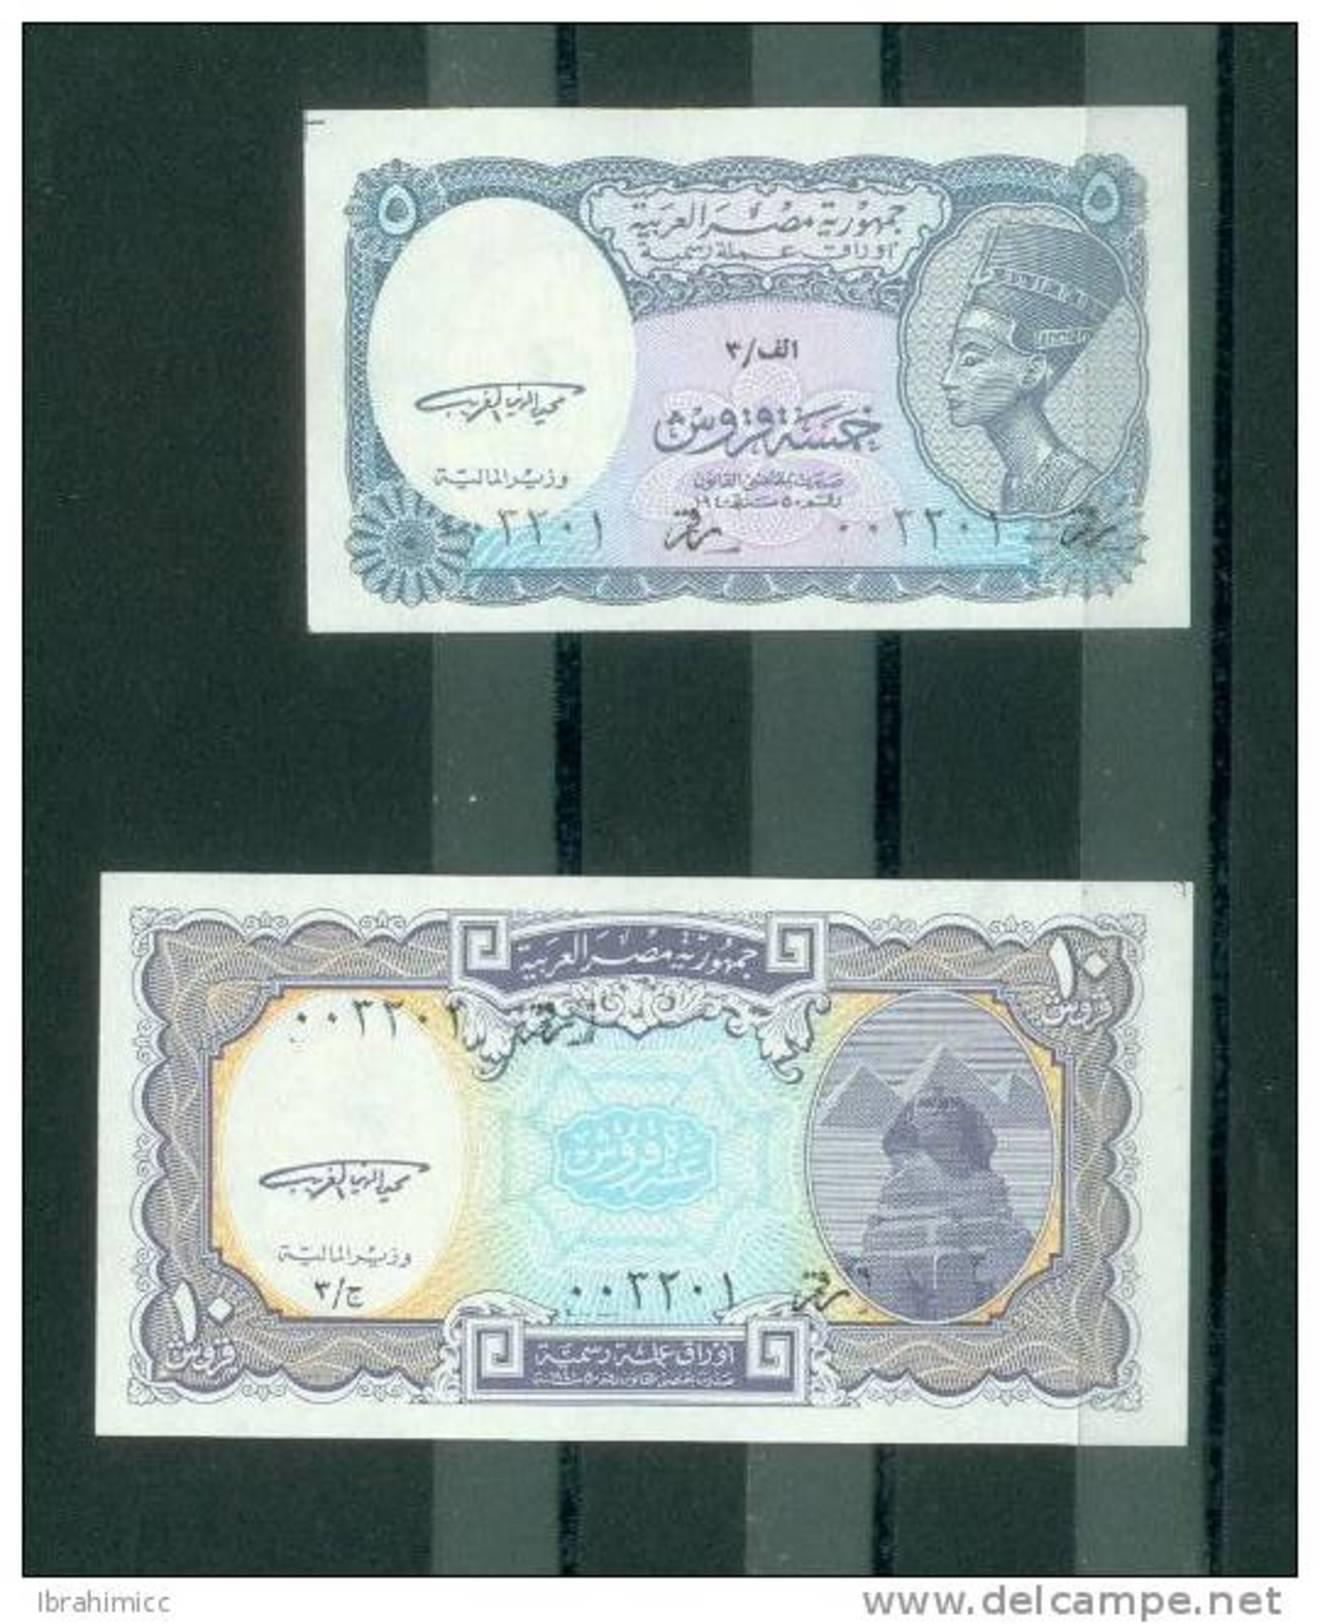 EGYPT - 5 & 10 PIASTERS SIGNATURE / M. EL GHAREEB - SAME SERIAL NUMBERS  - UNC - Egipto